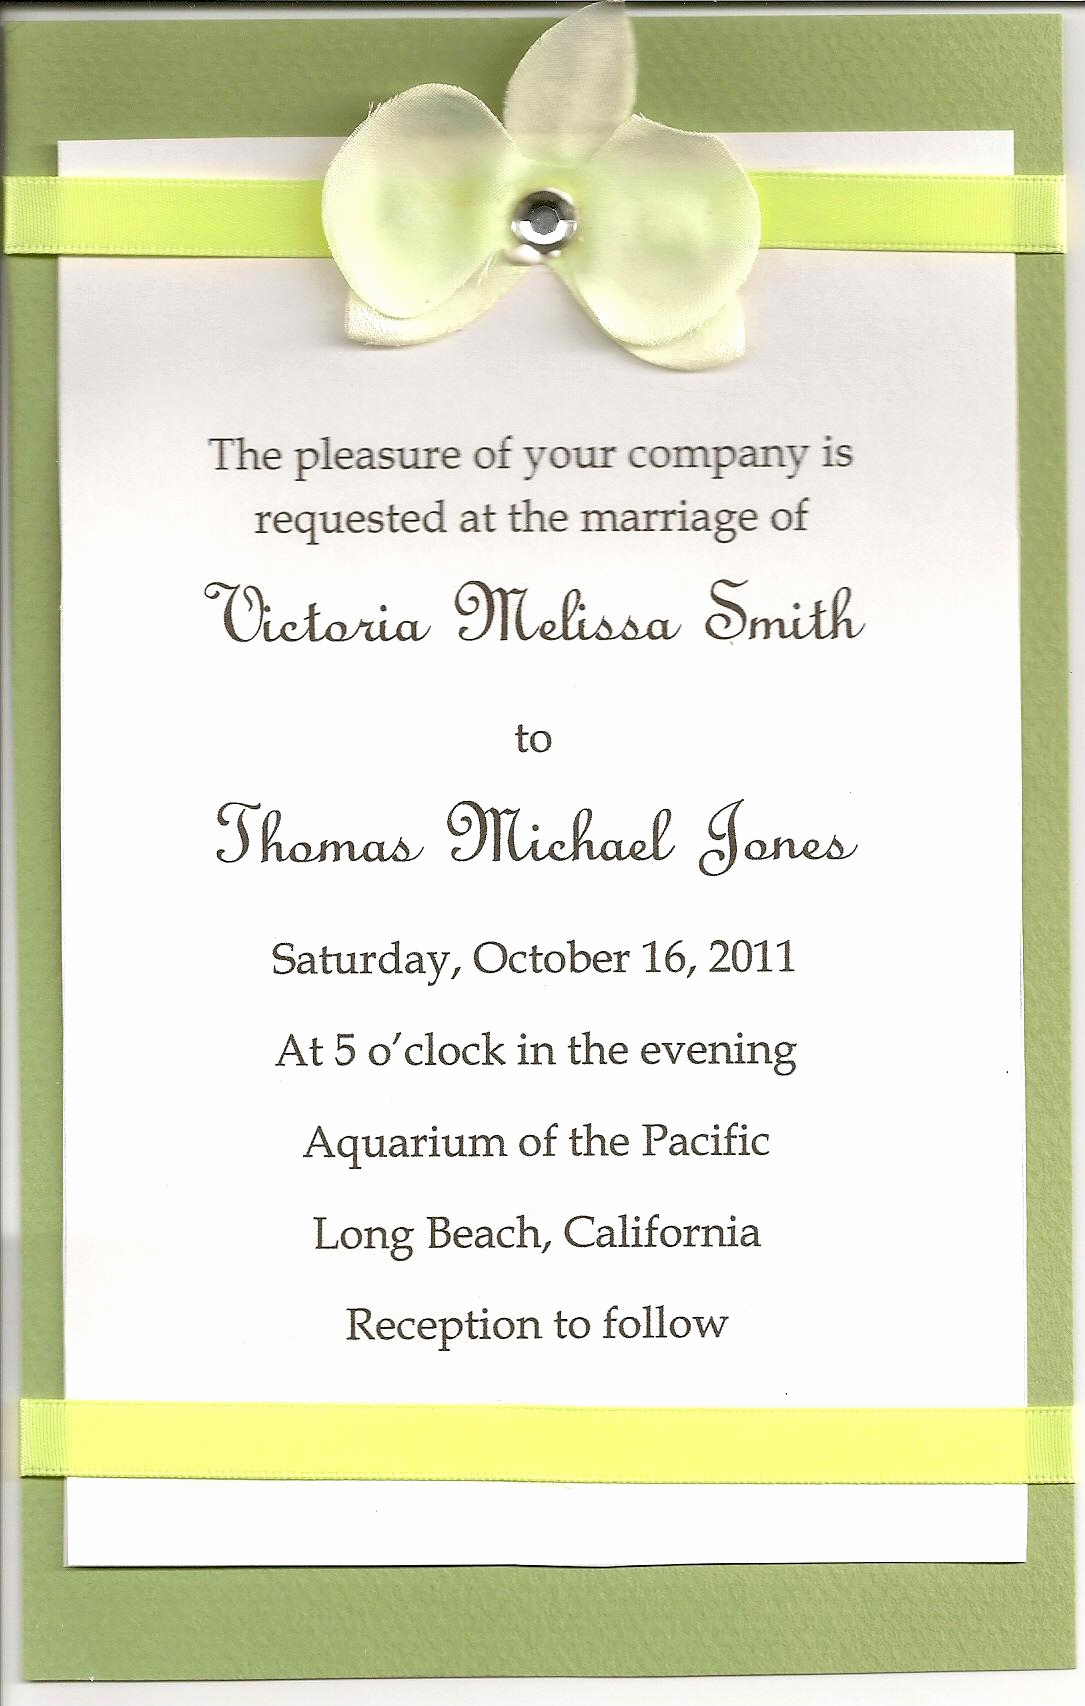 Wedding Invitation Wording Couple Hosting Beautiful Wedding Invitation Sample Content